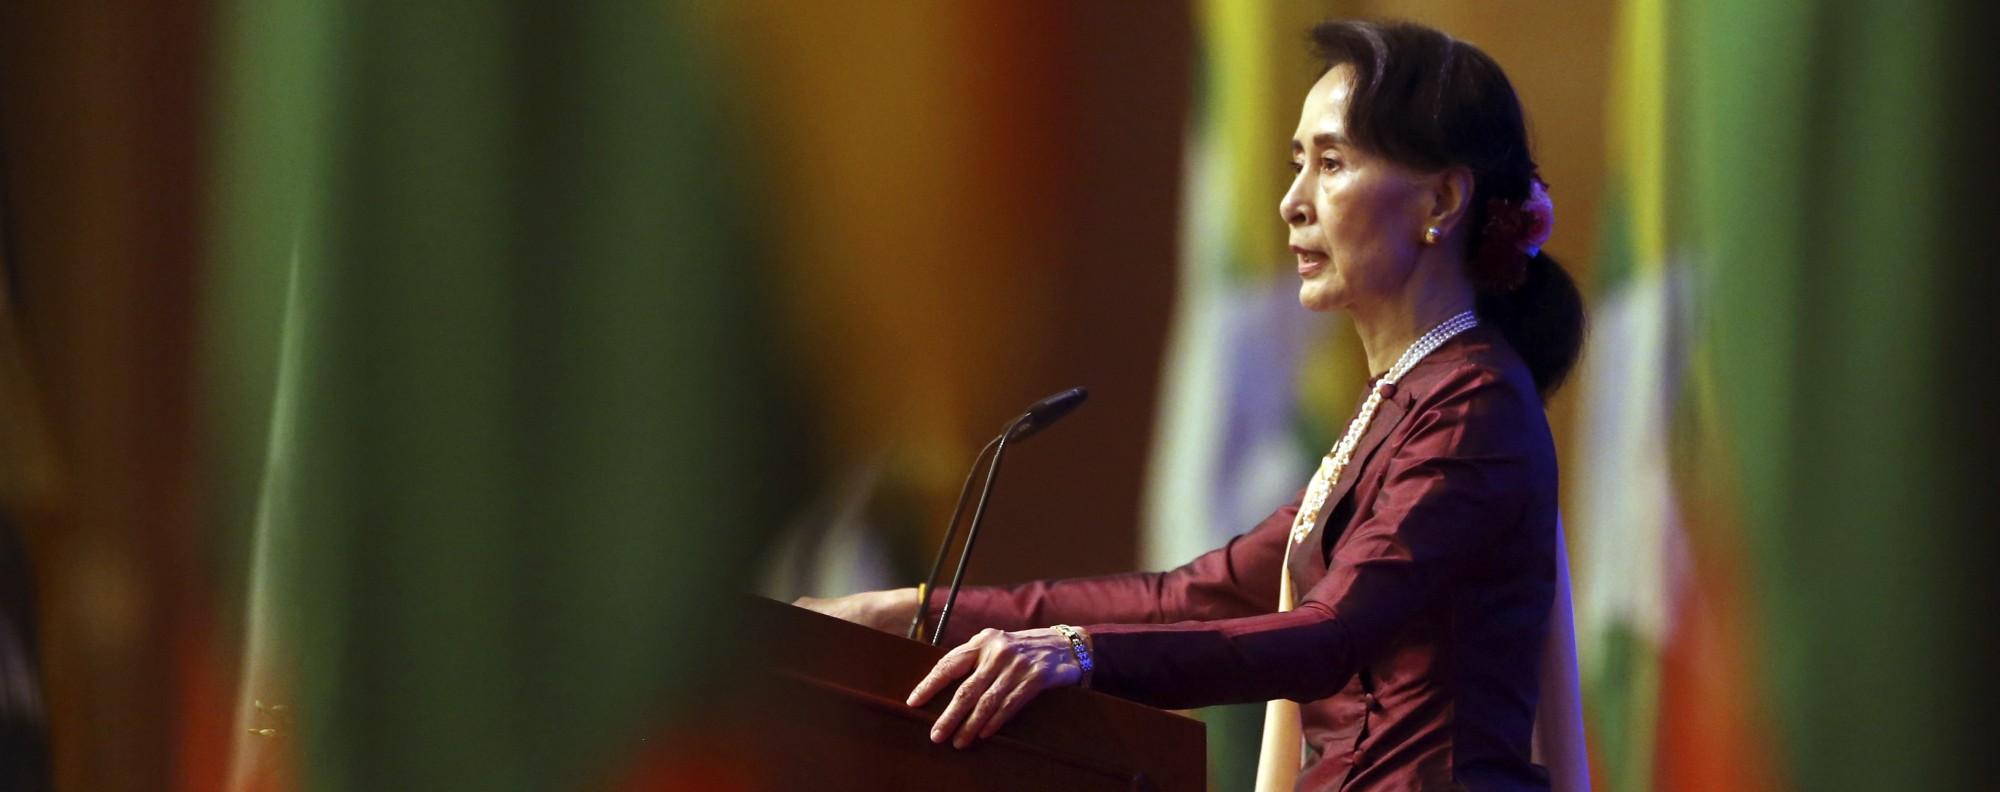 Myanmar's State Counsellor Aung San Suu Kyi. Photo: AFP